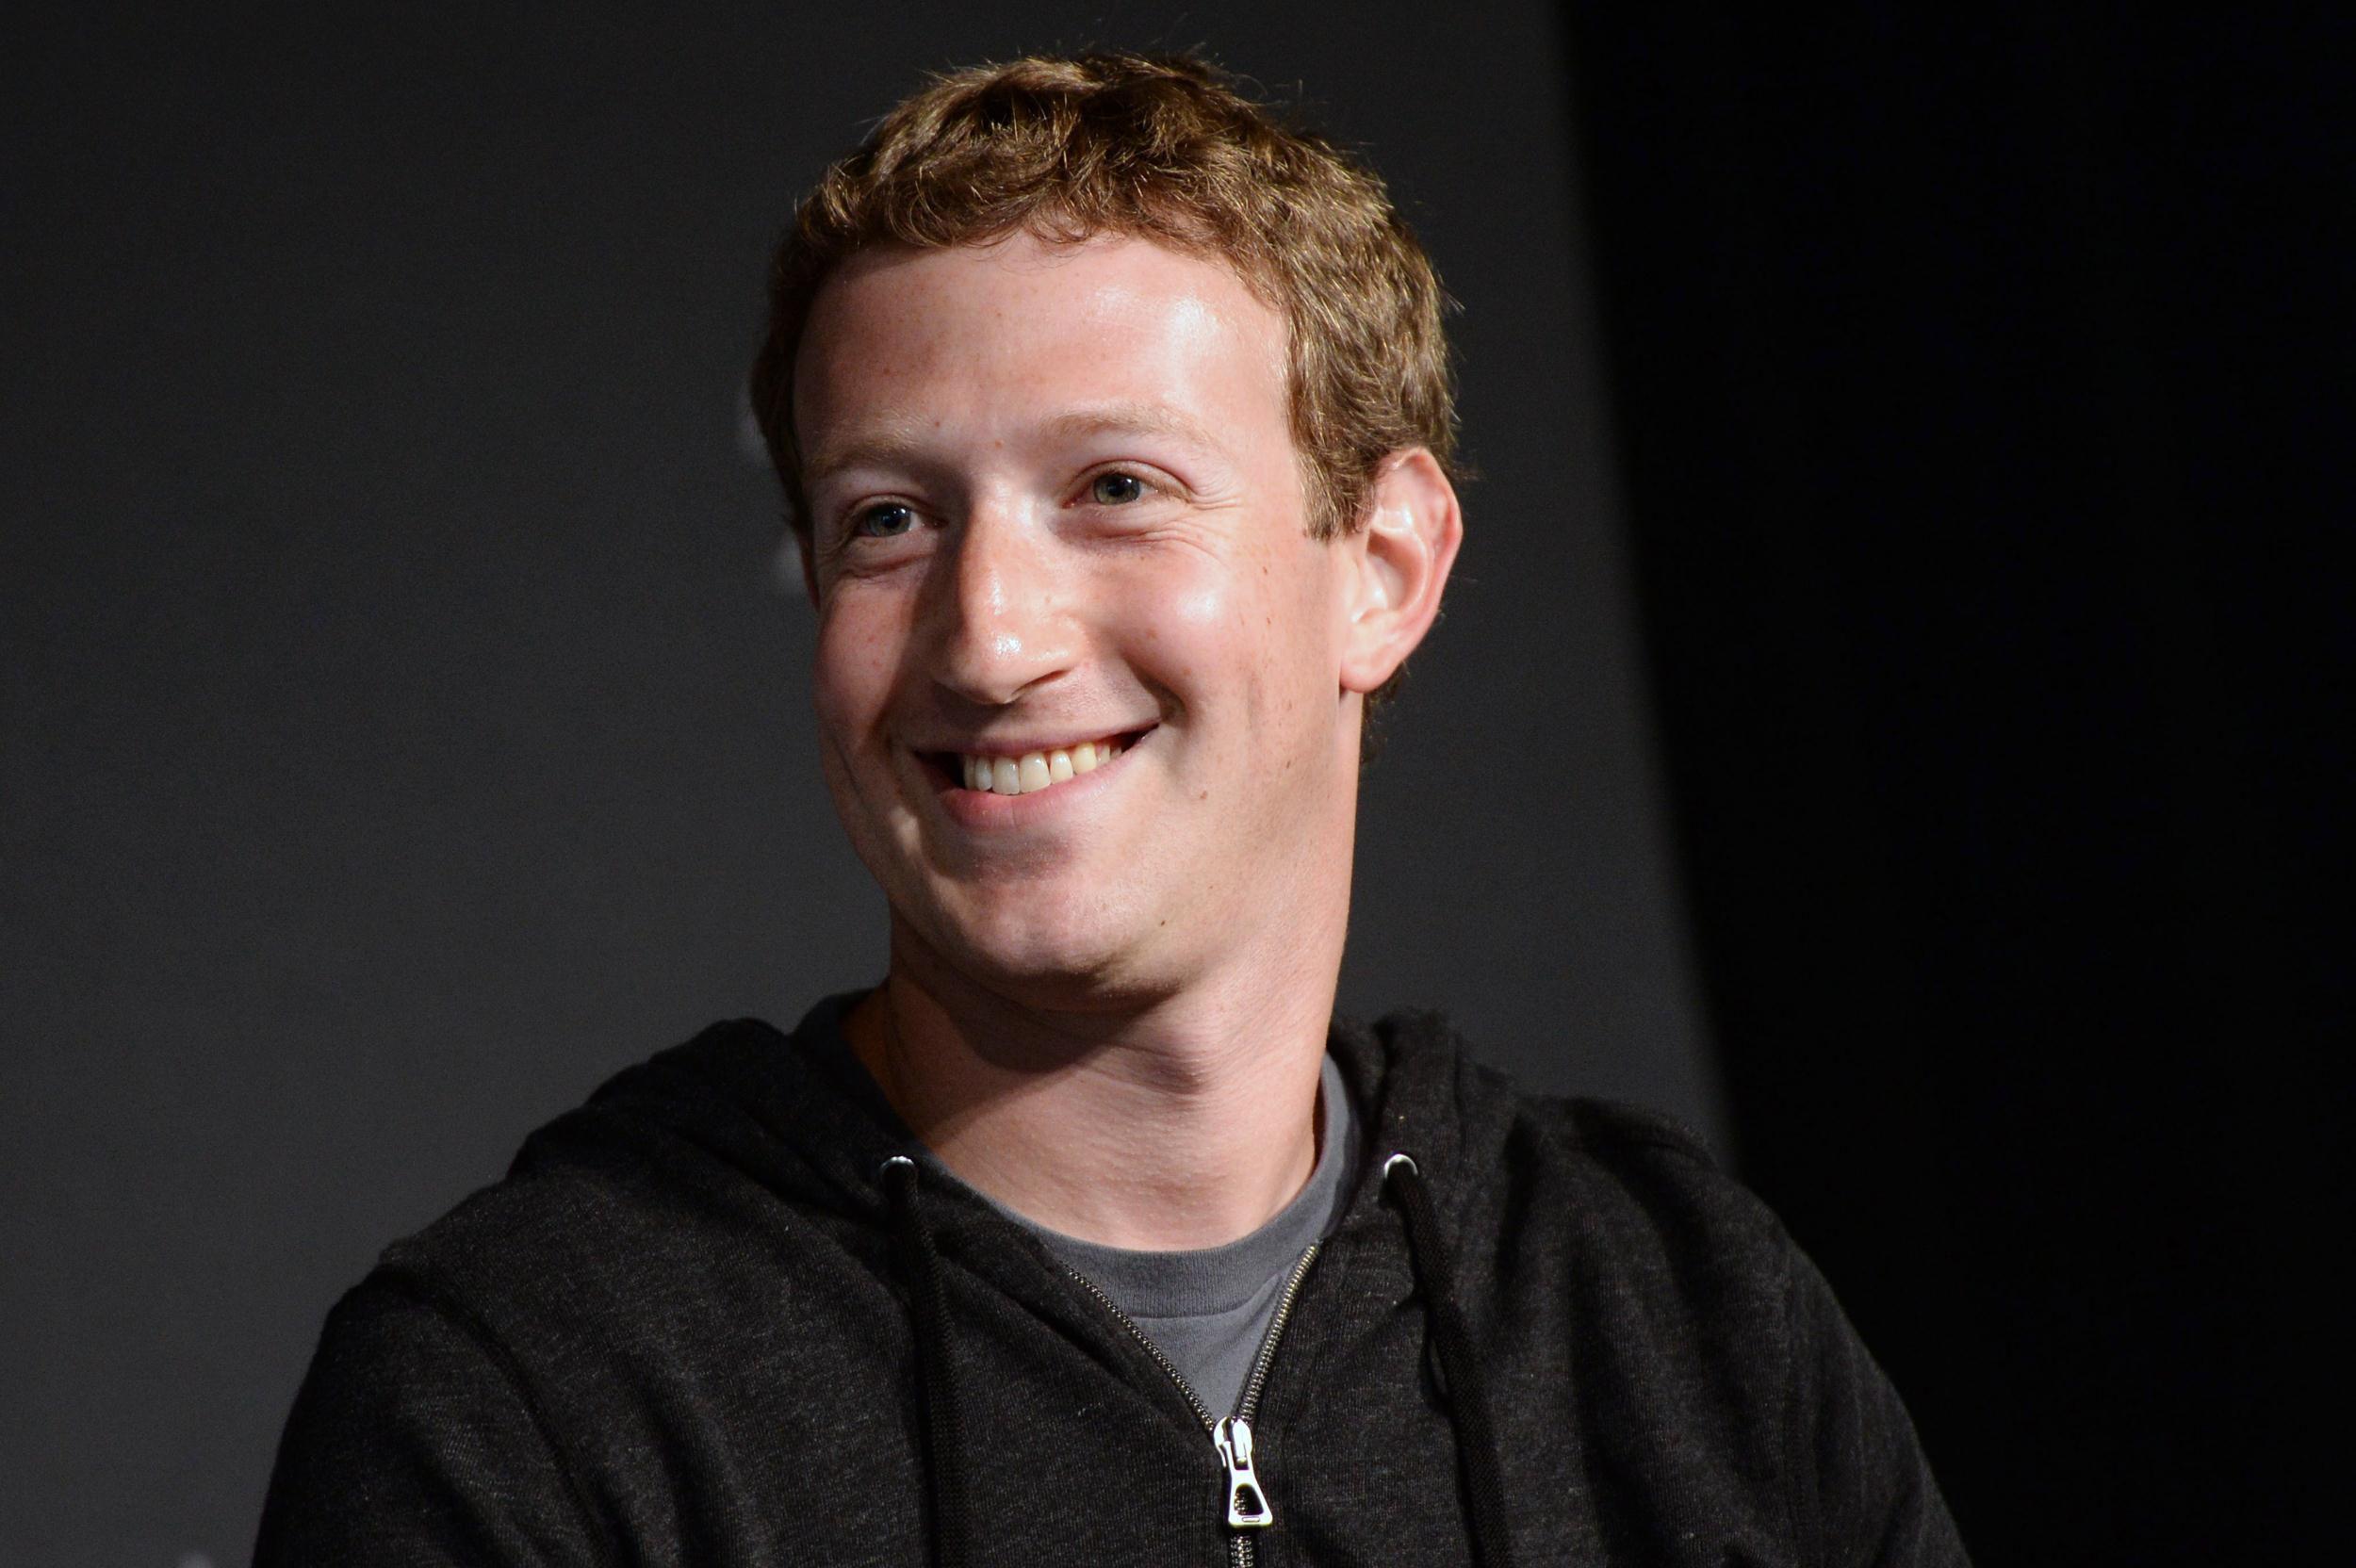 Mark Zuckerberg Computer Wallpaper 2500x1664